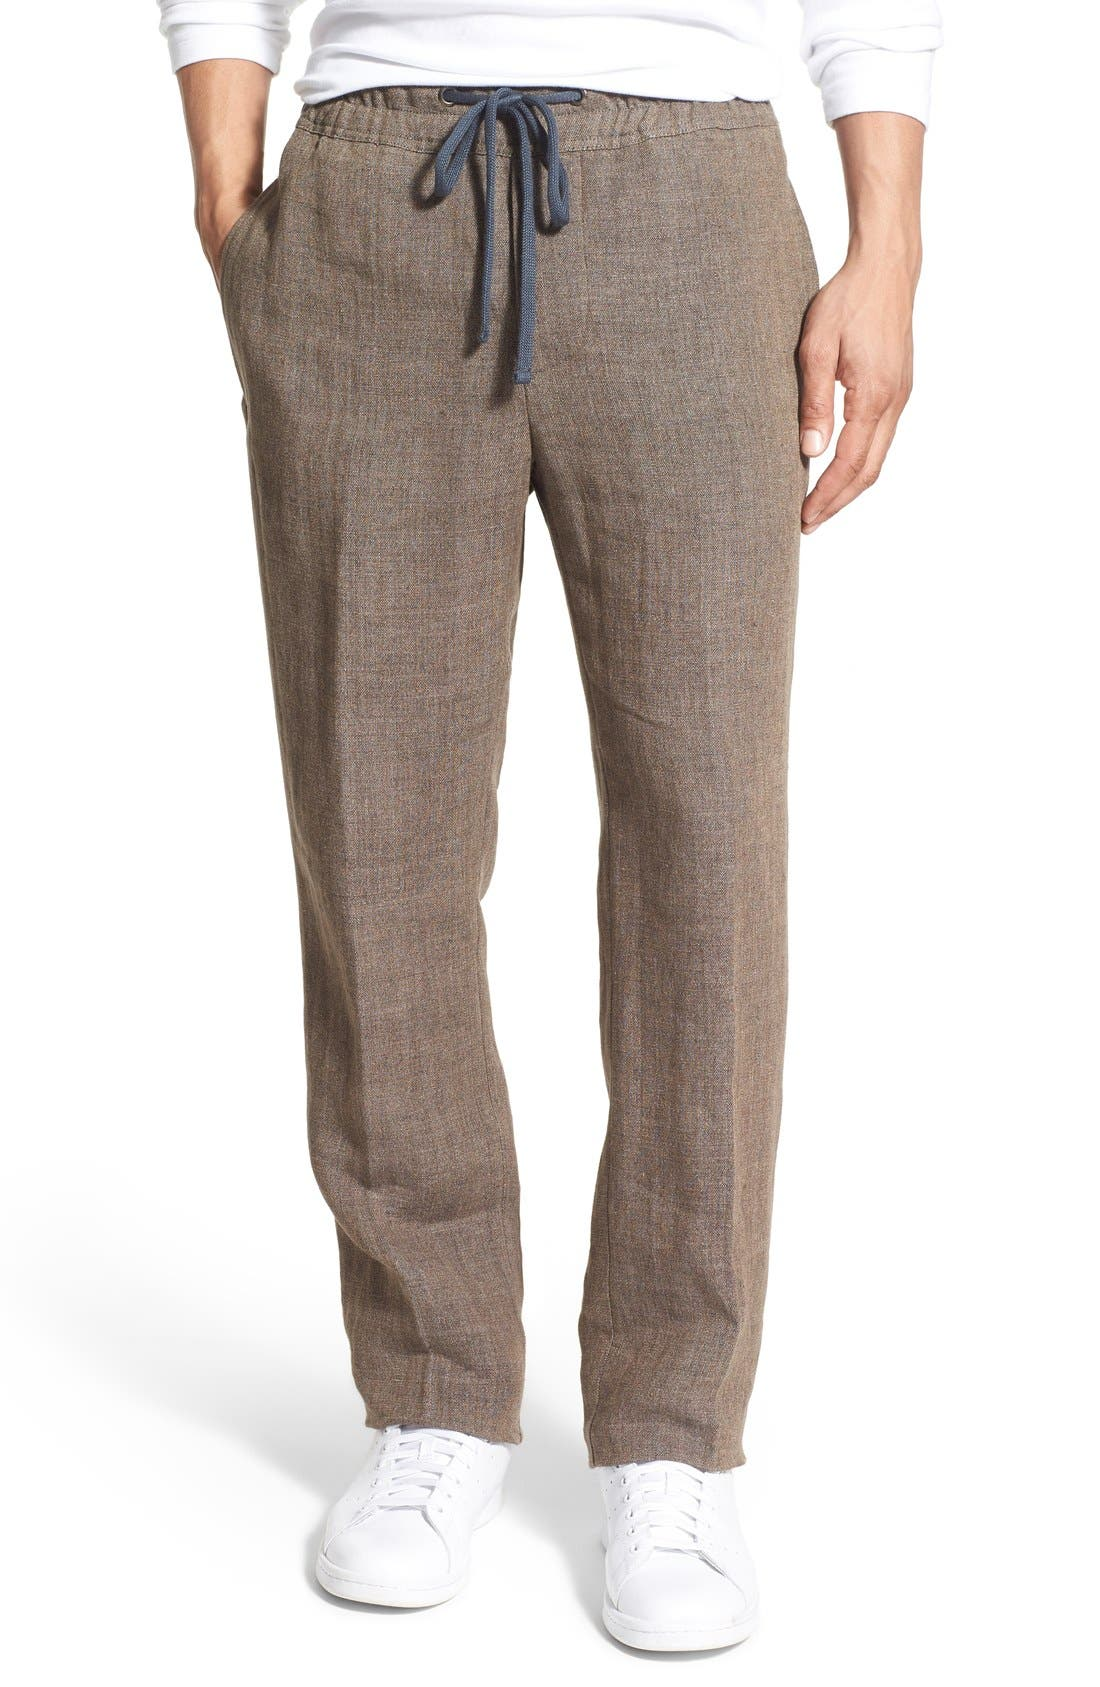 James Perse 'Delave' Drawstring Linen Pants